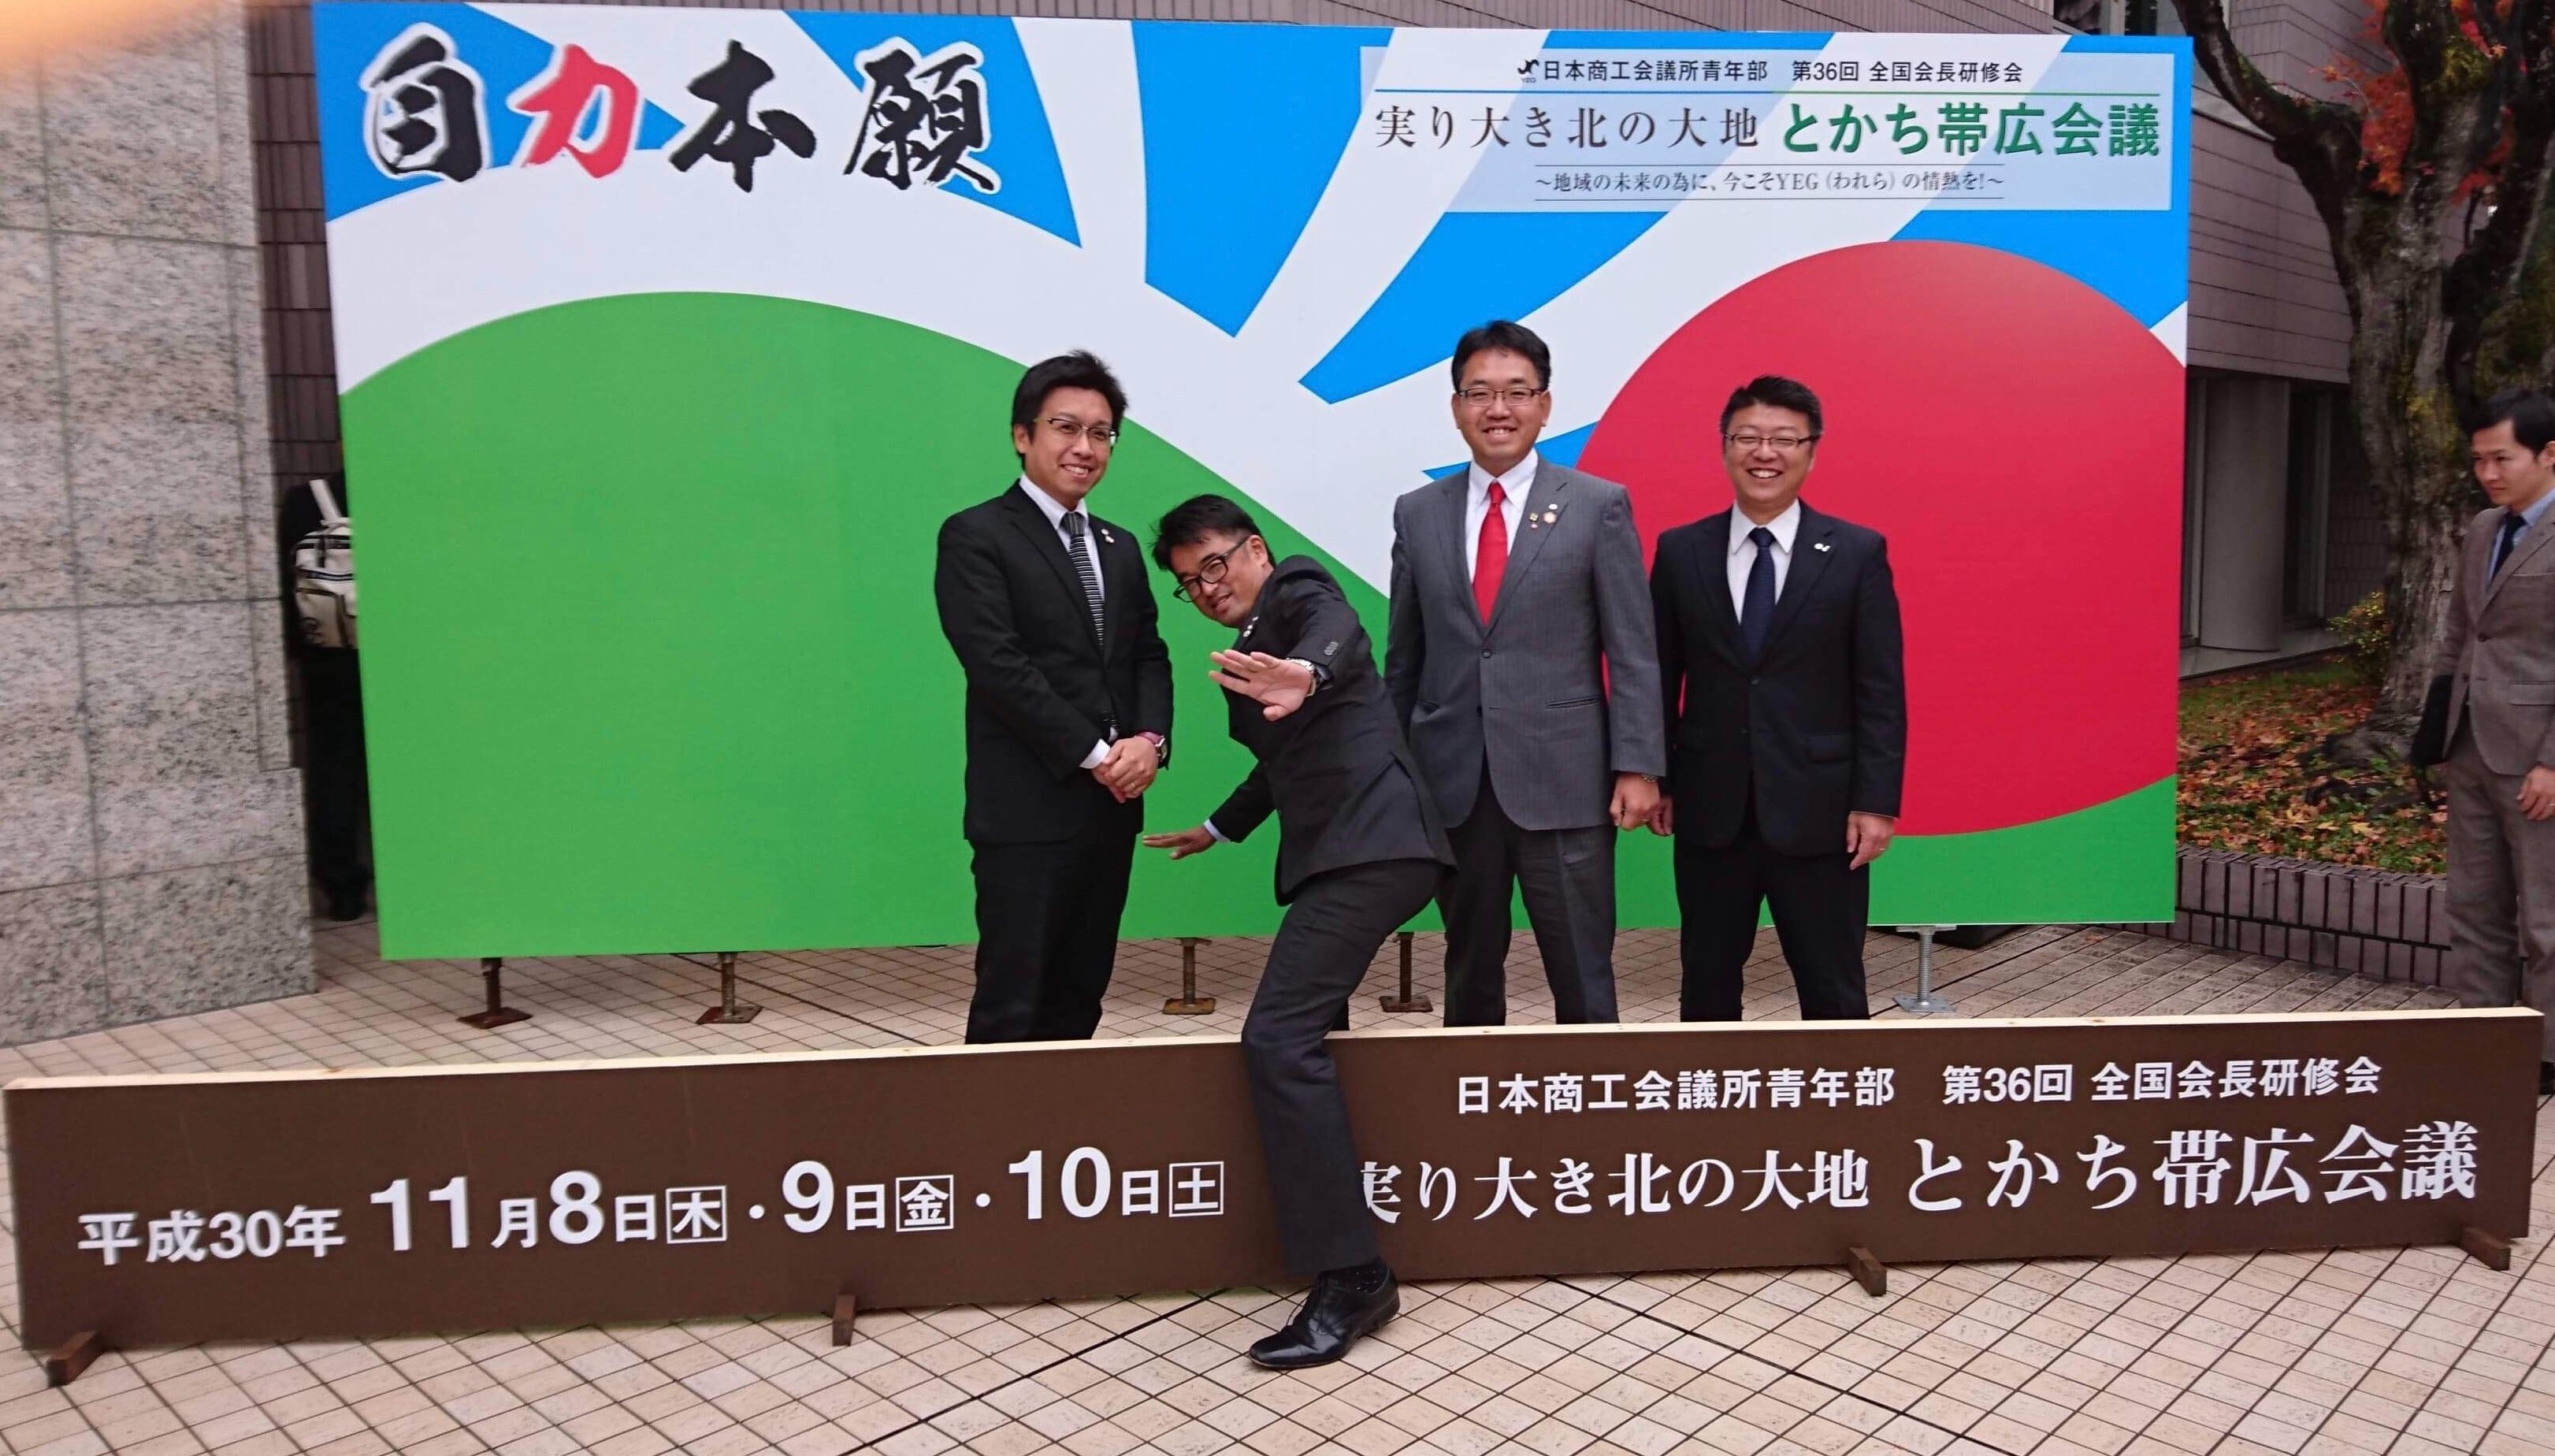 f:id:masanori-kato1972:20190327183508j:image